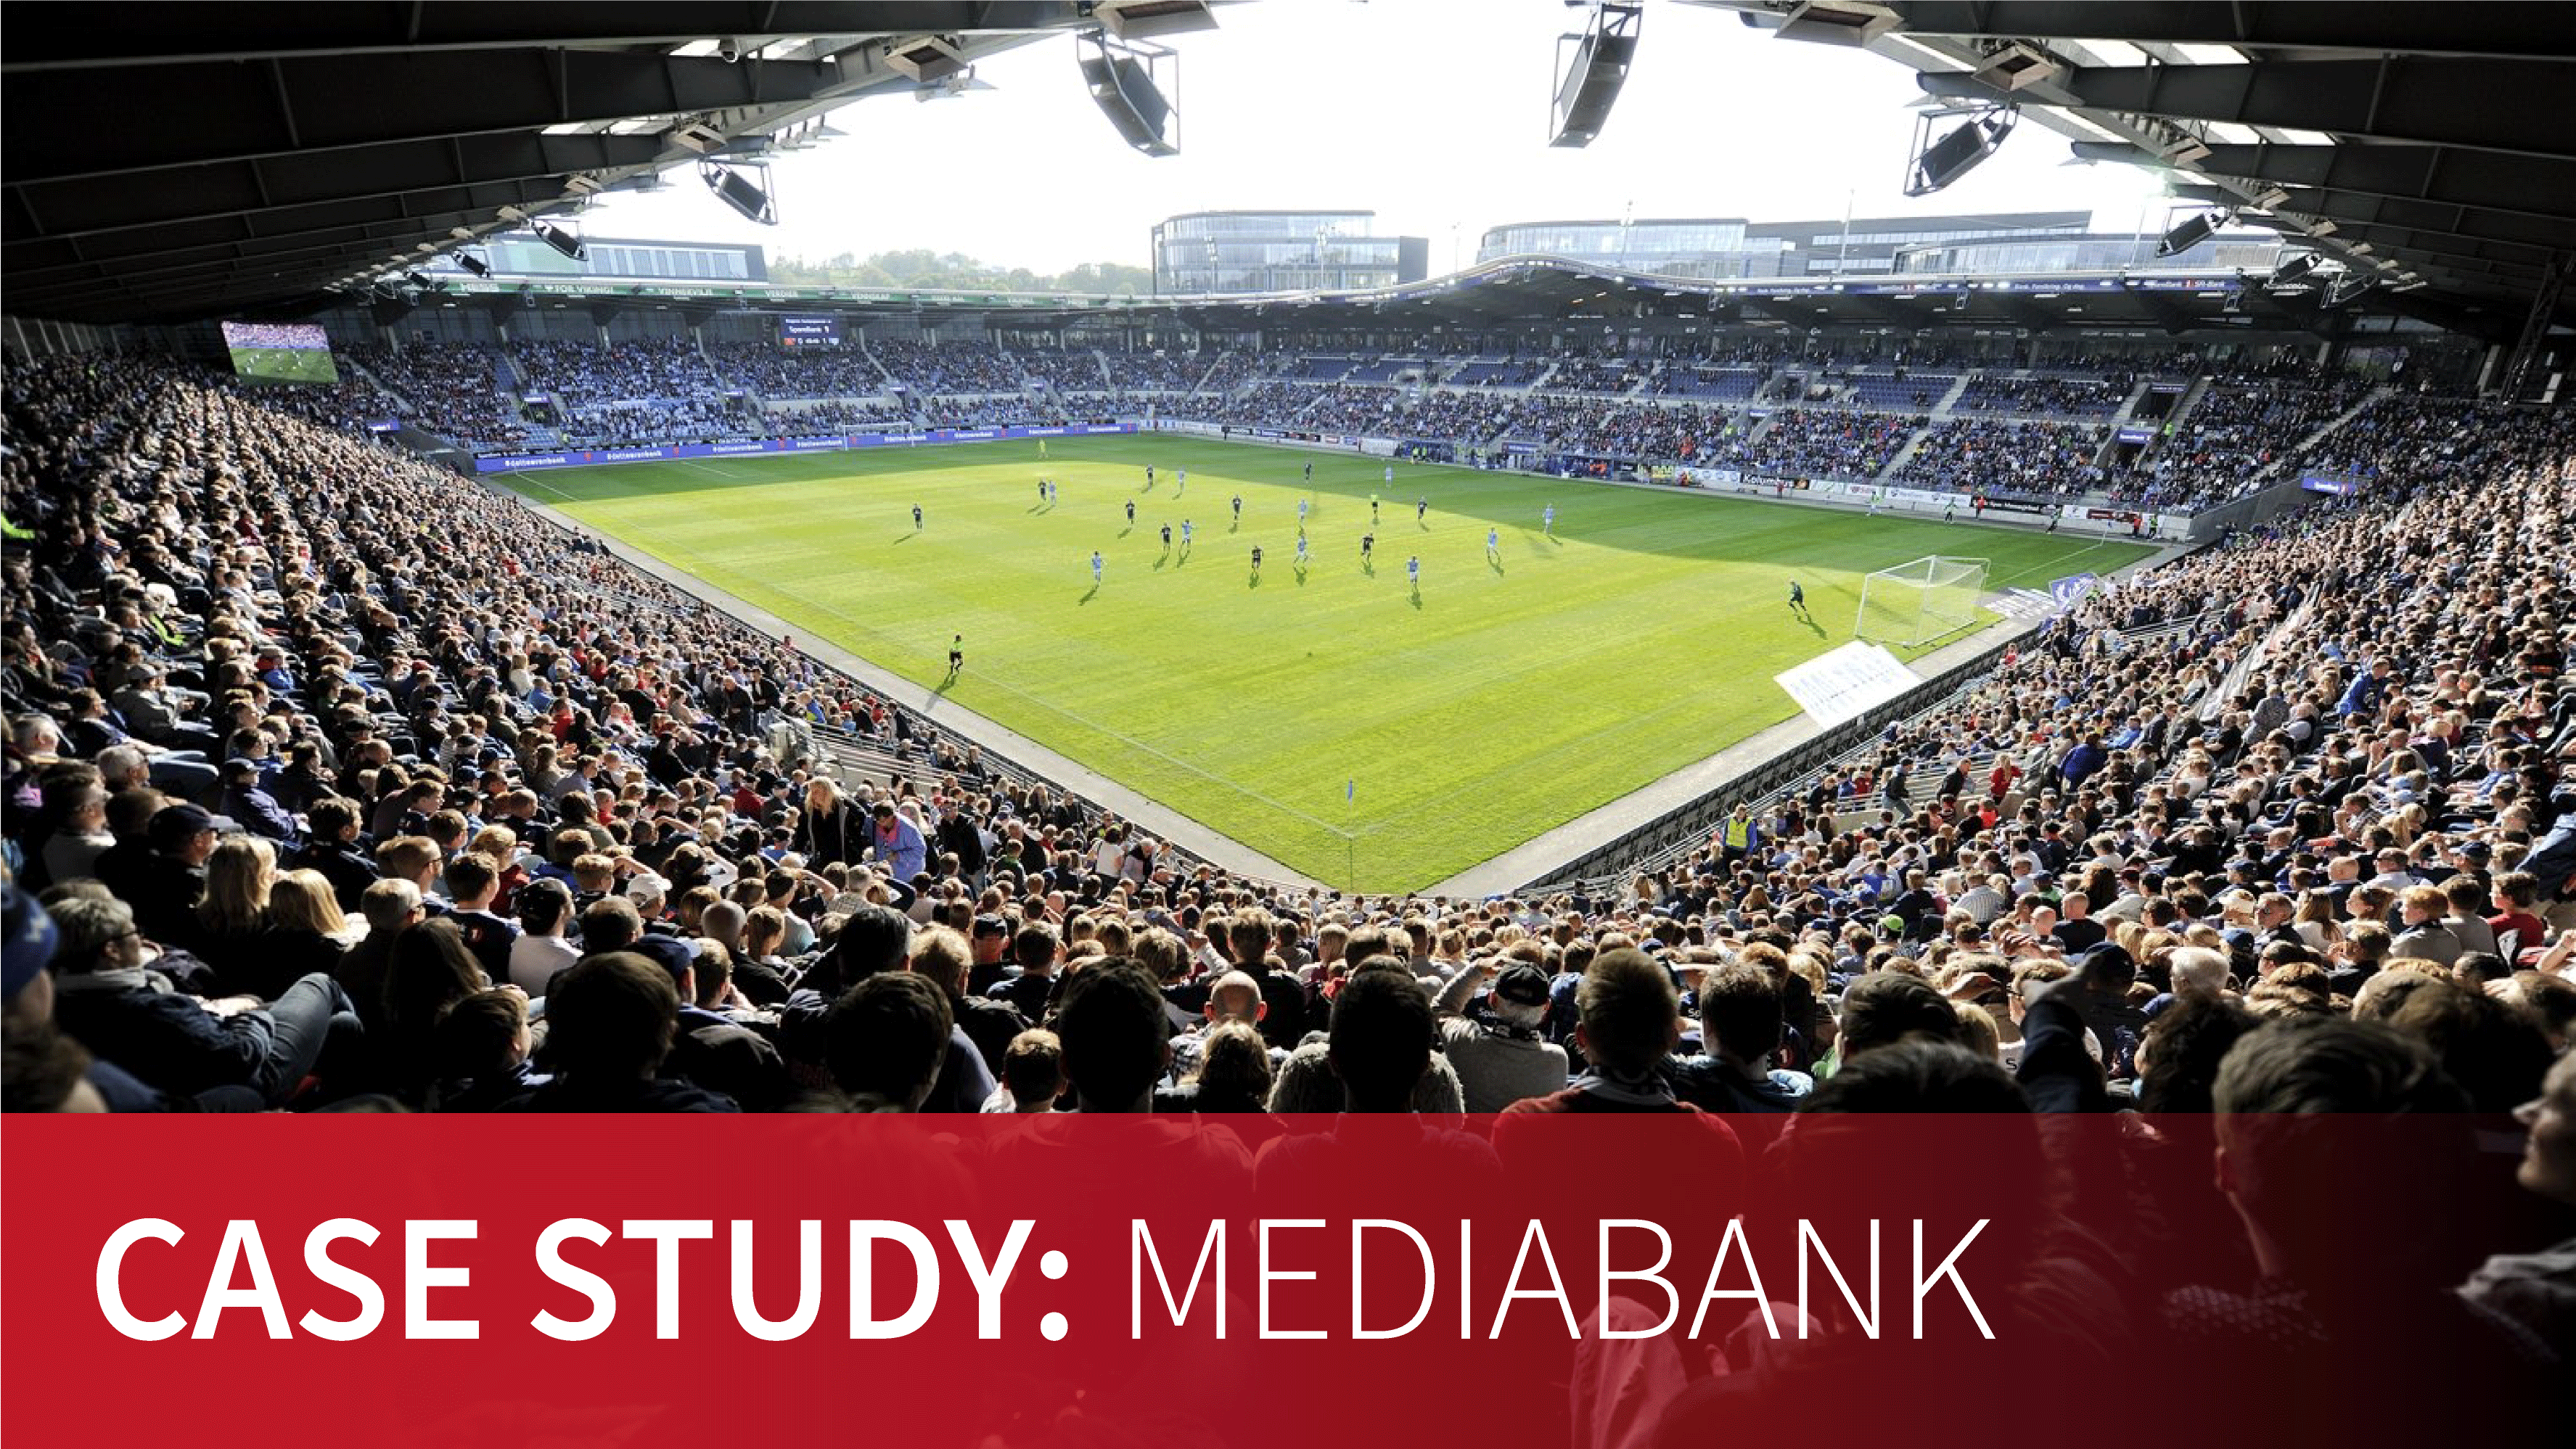 Case Study: Mediabank